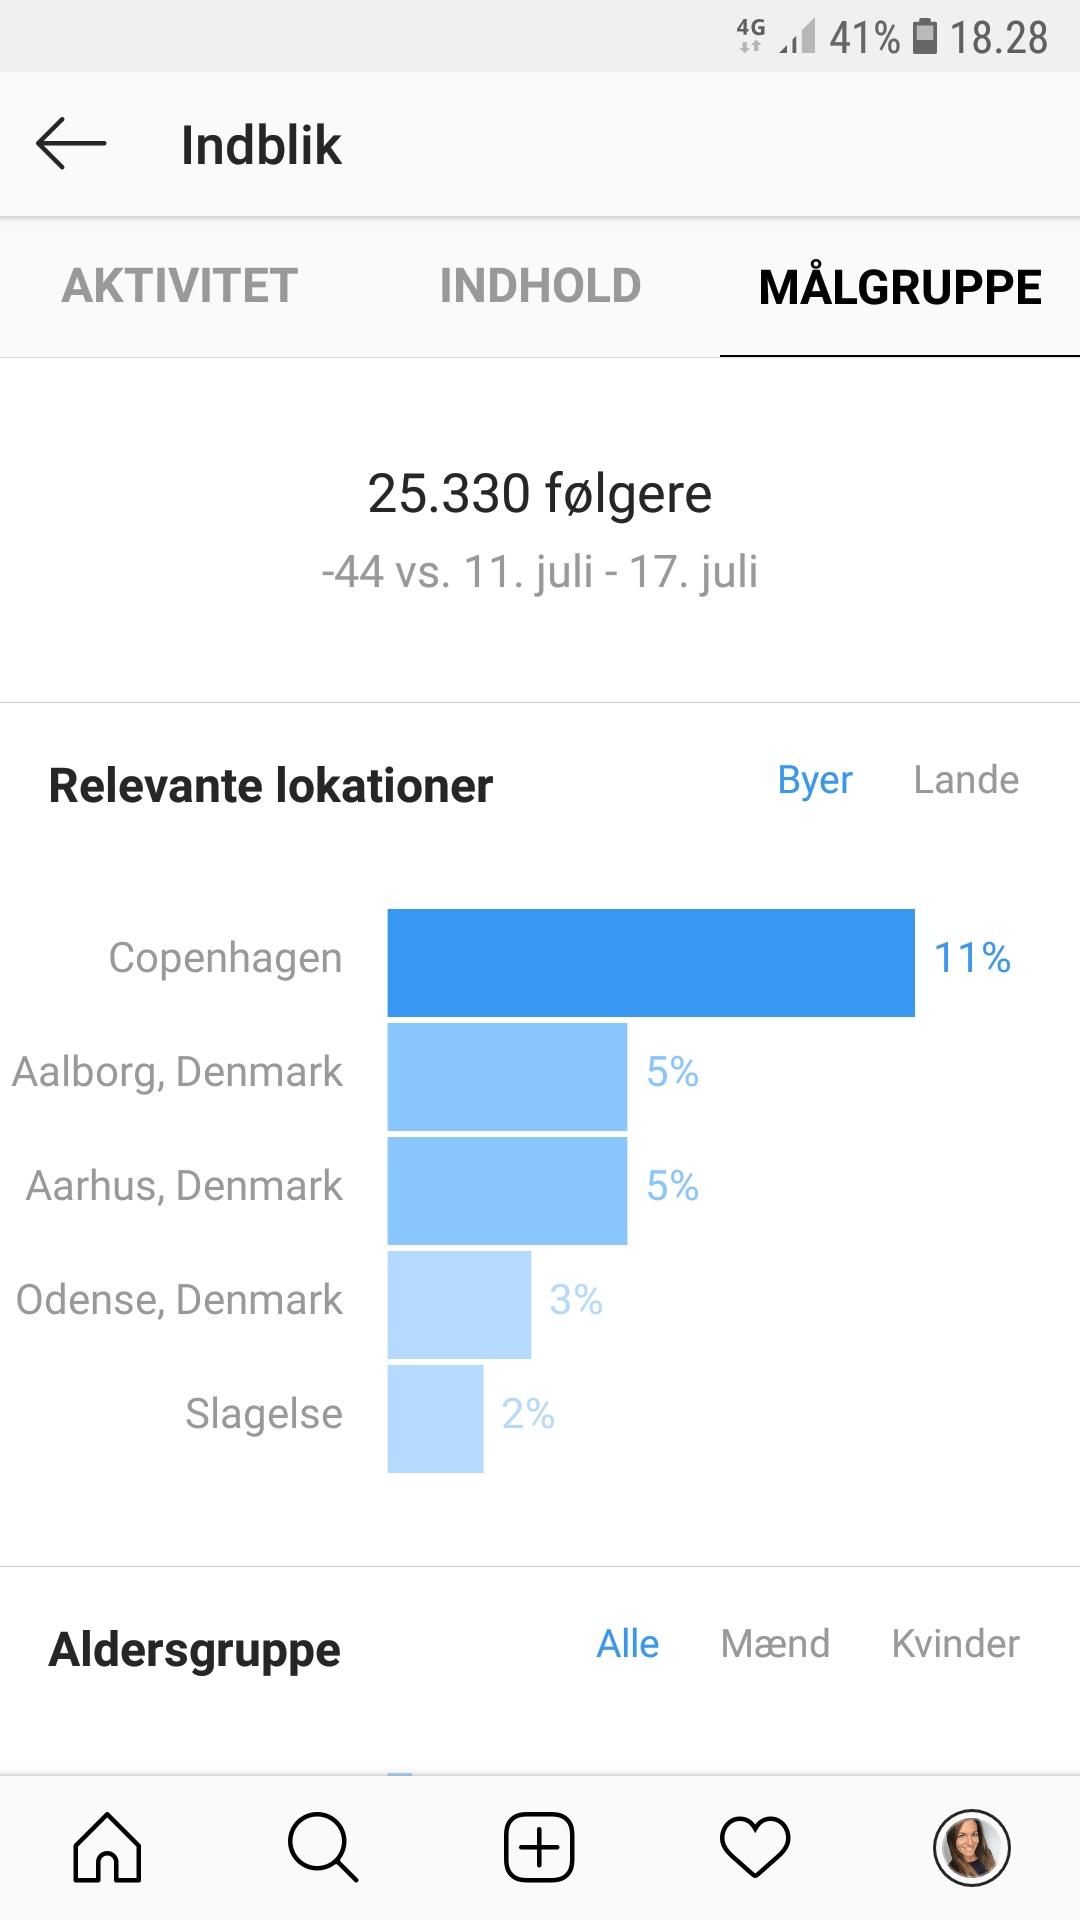 demografi Instragram1 - BloggerSpace